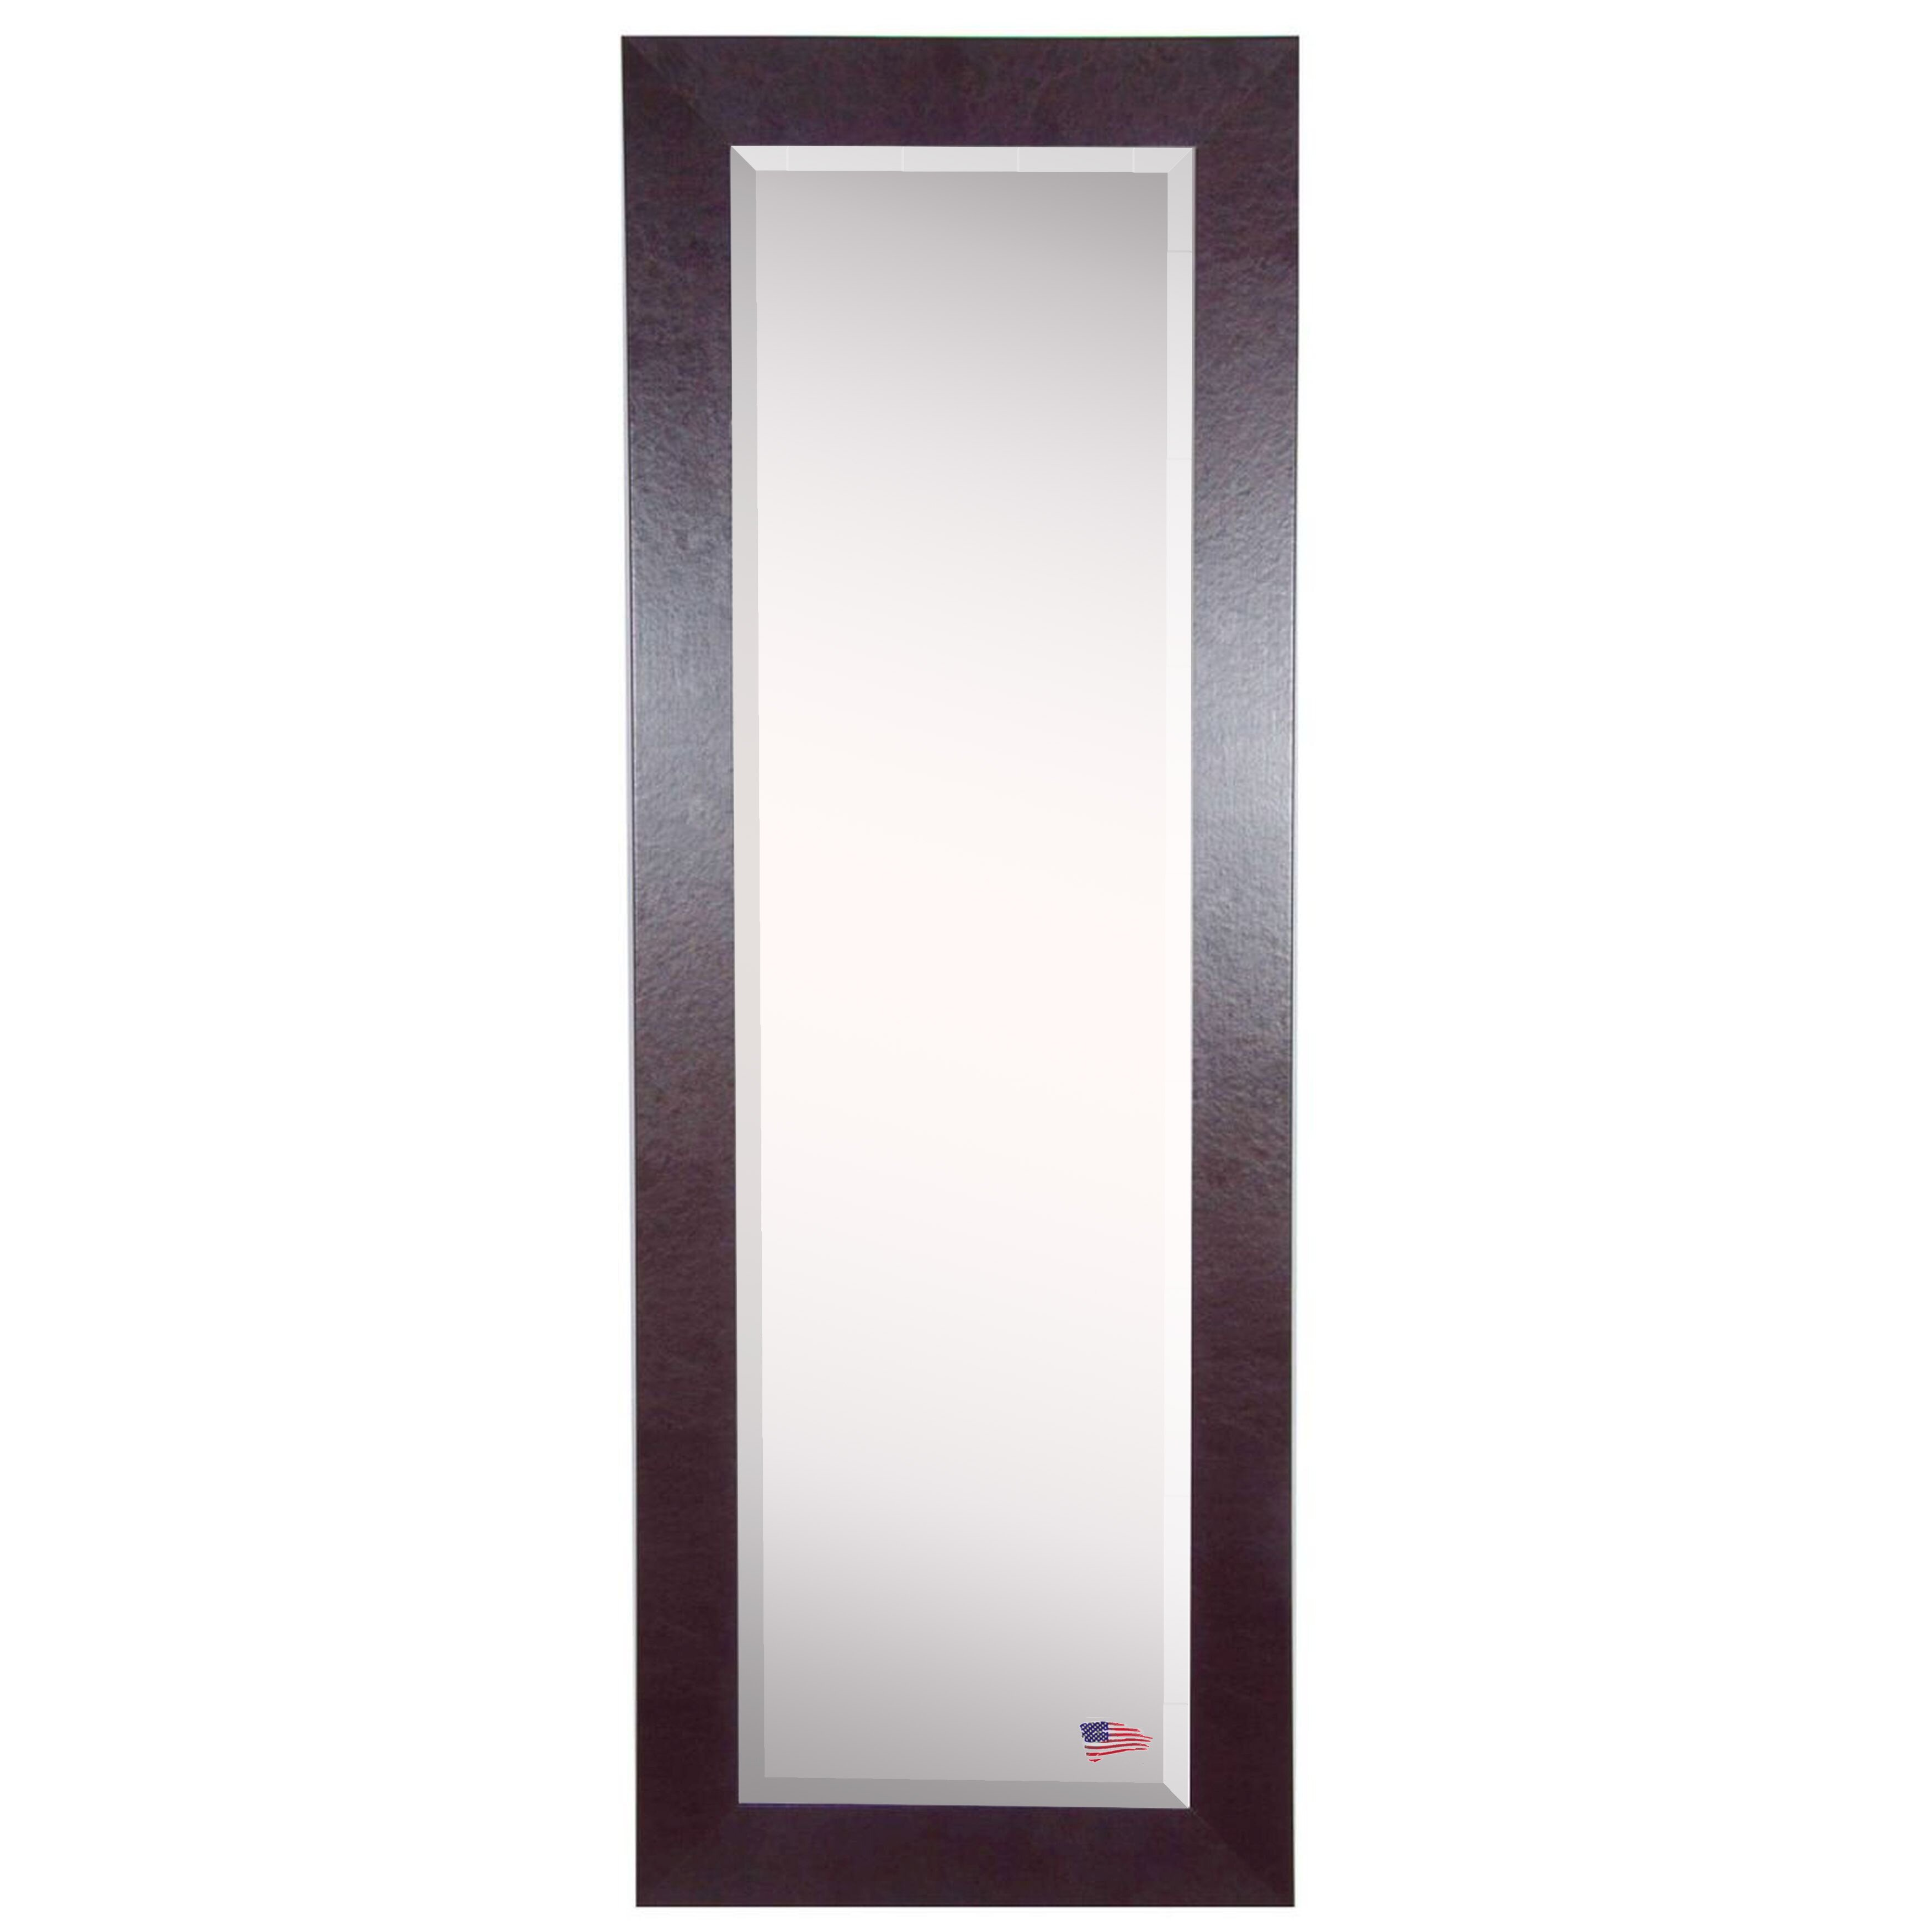 Rayne Mirrors Jovie Jane Brown Leather Full Length Beveled